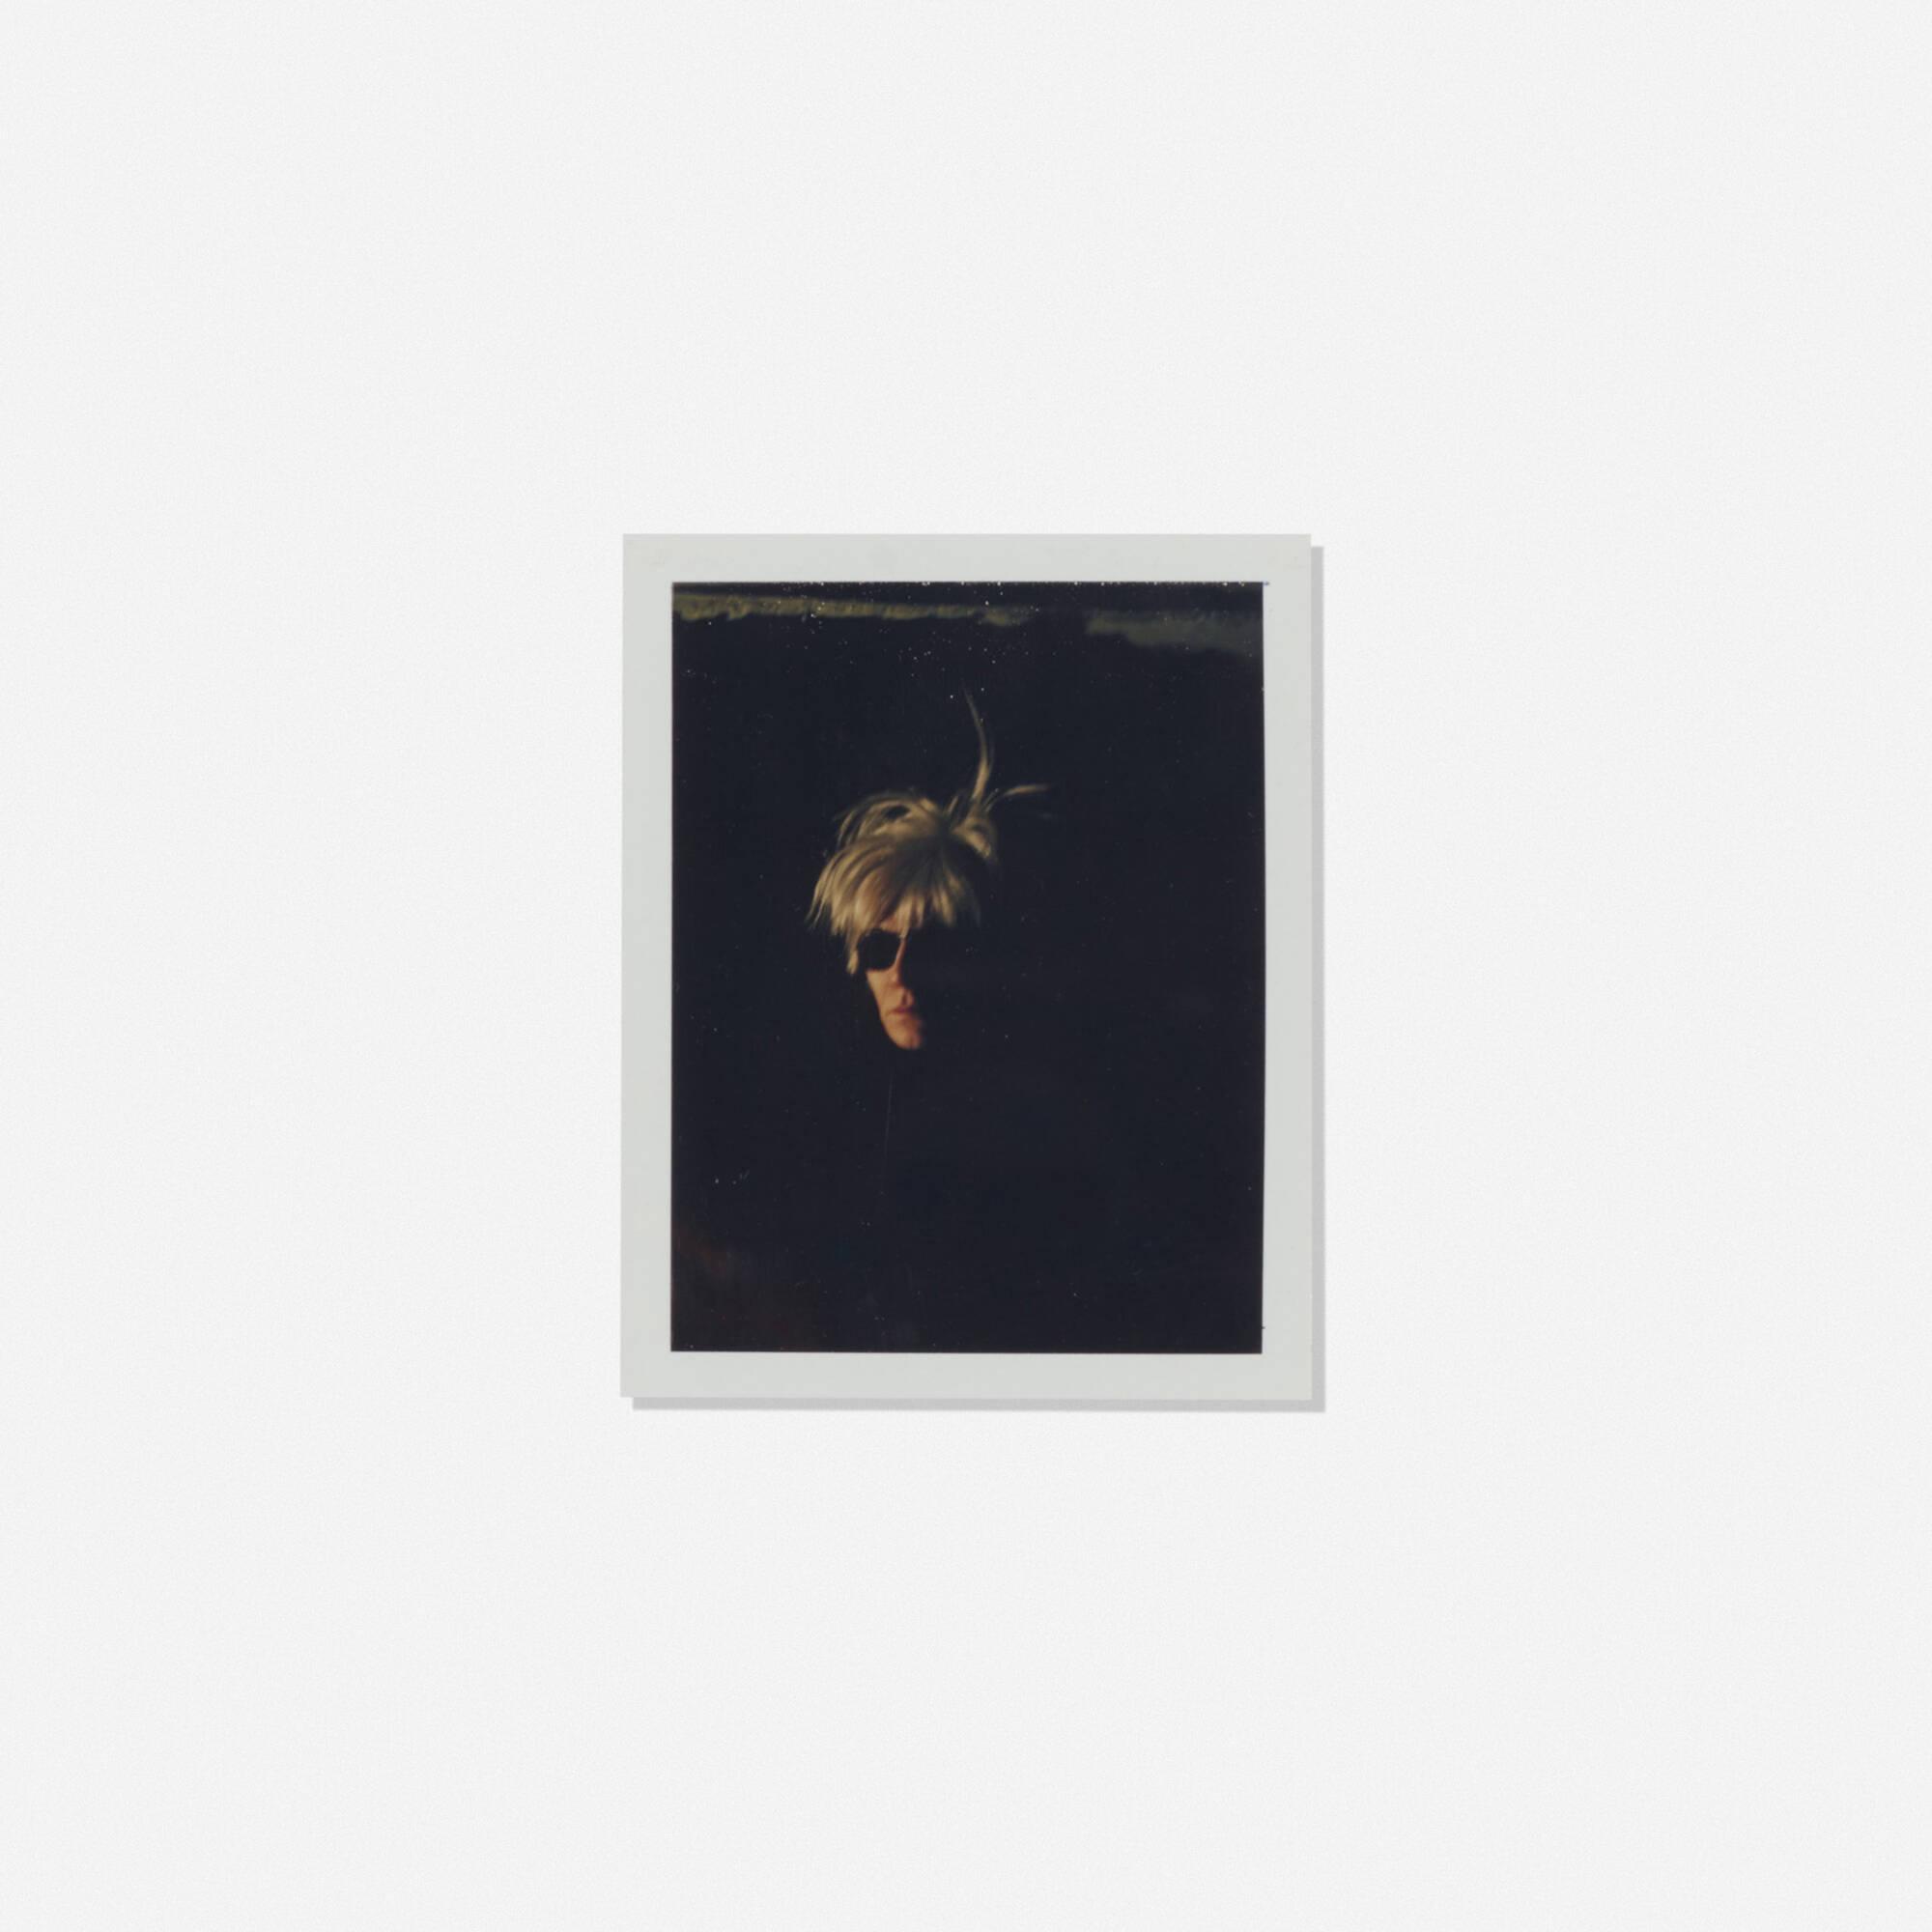 209: Andy Warhol / Self-portrait (Fright Wig) (1 of 1)